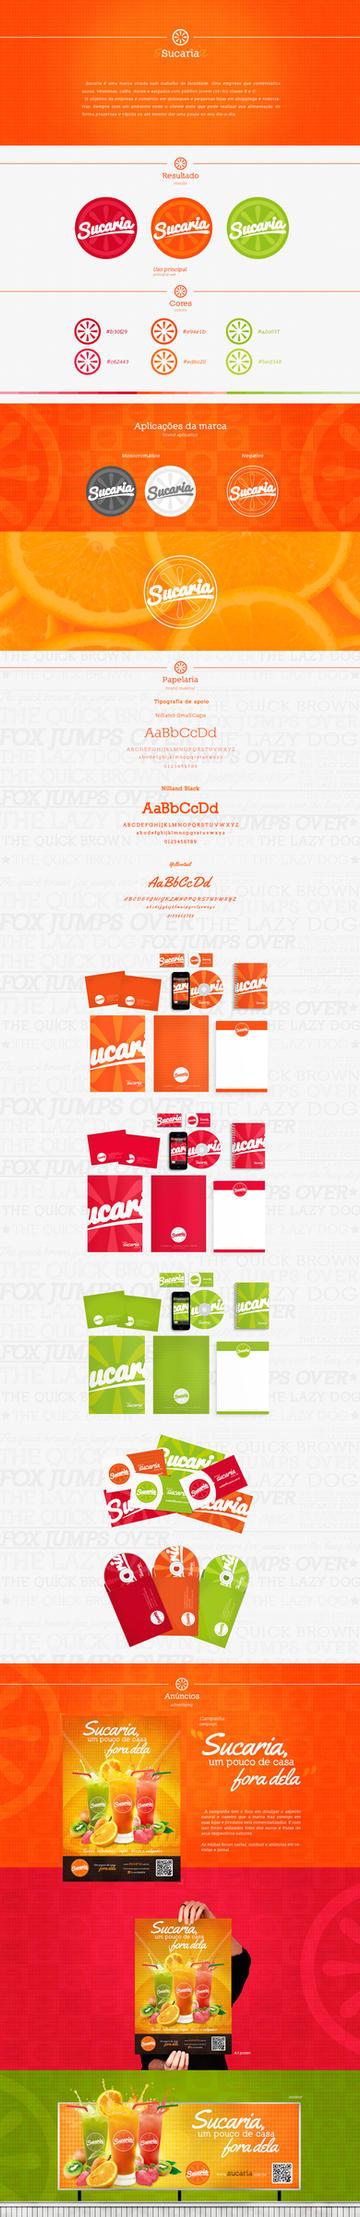 Sucaria Branding by rodrigoounao